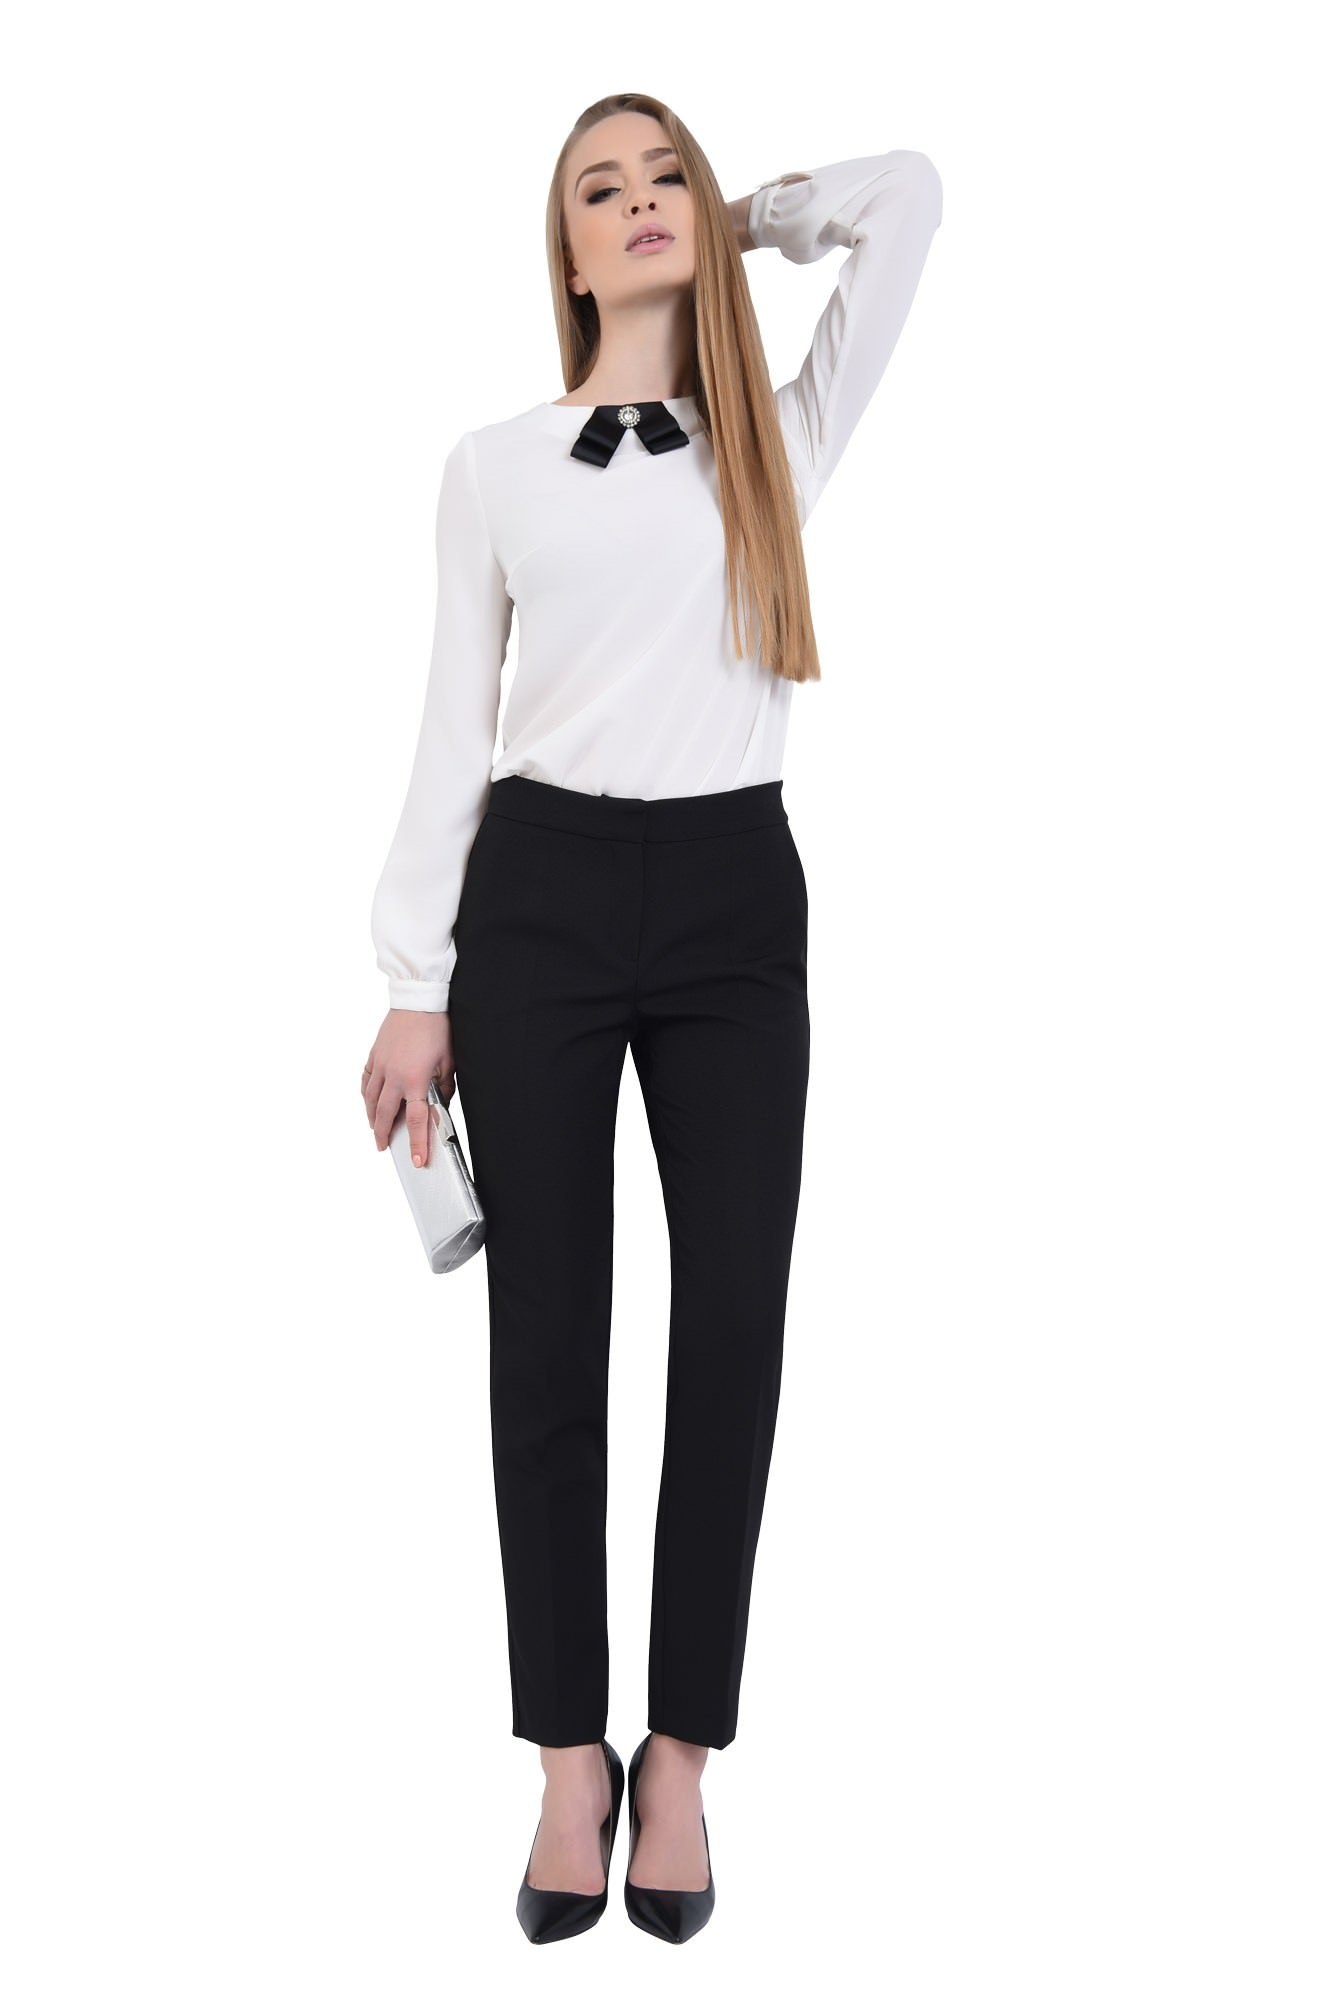 3 - 360 - Pantaloni pana, de birou, lungi, croi tigareta